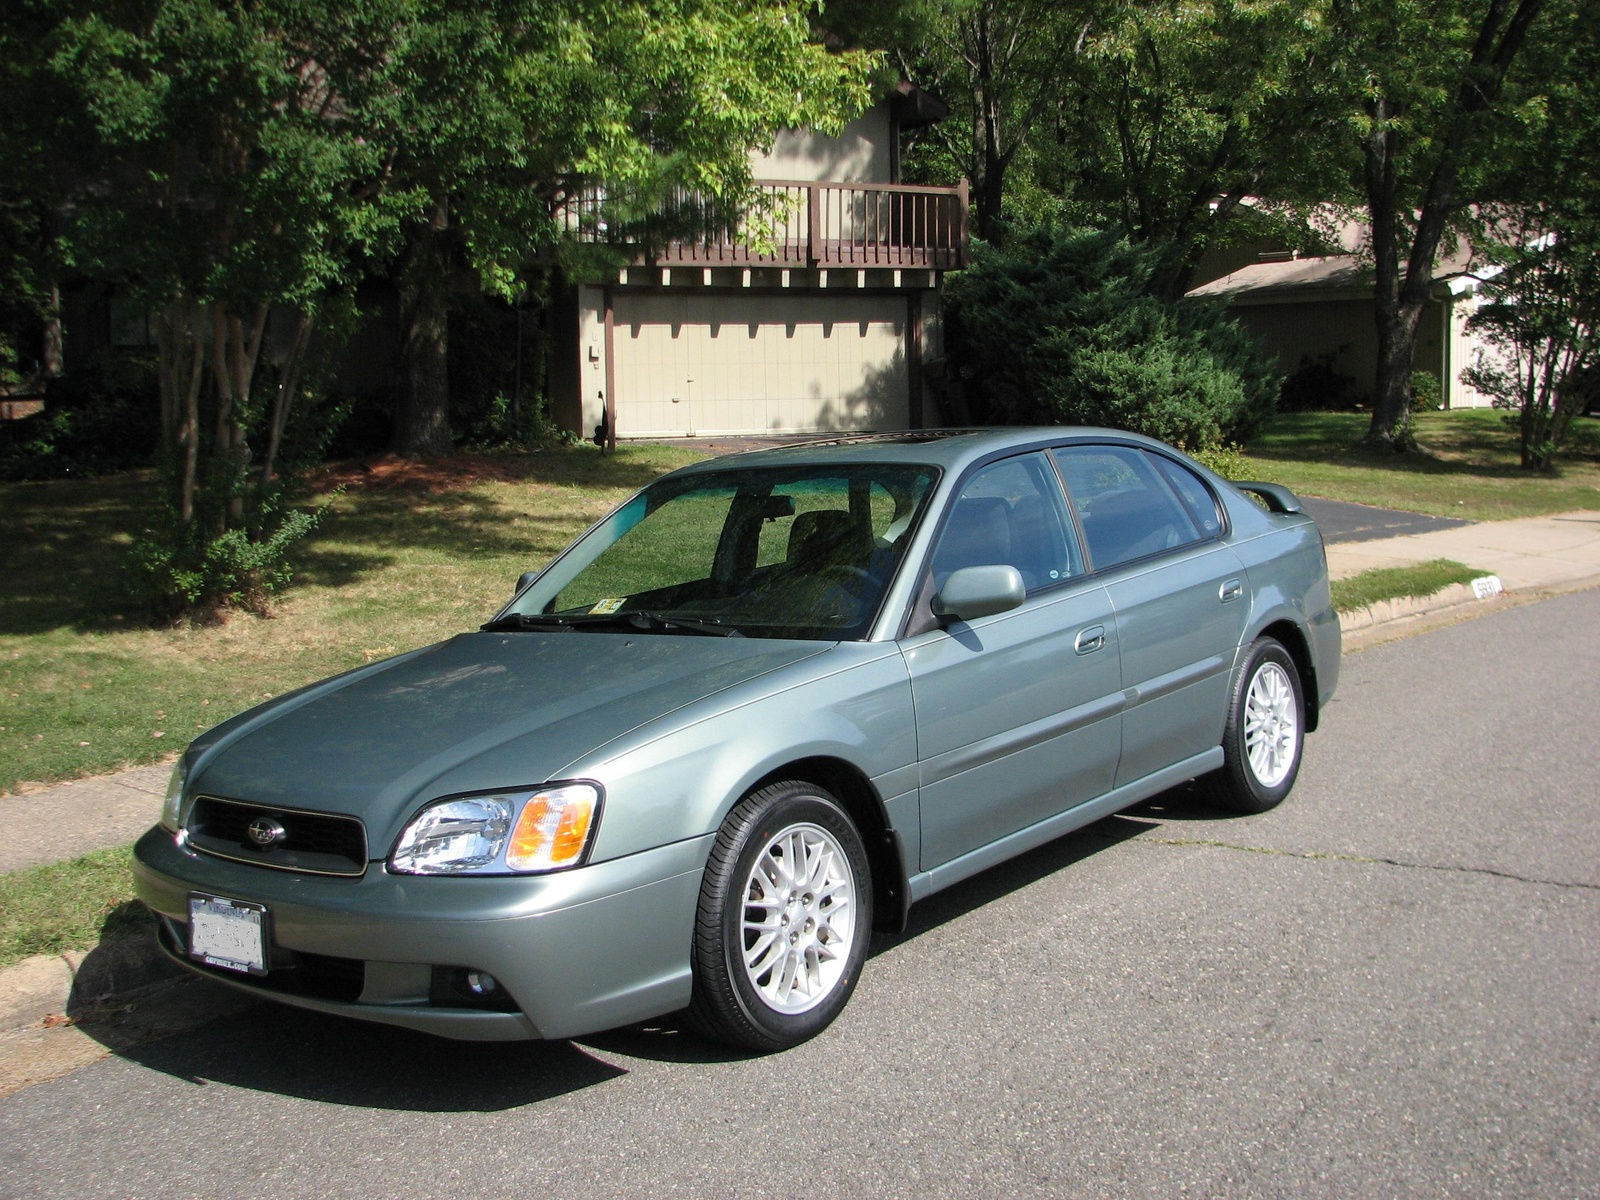 Picture of 2003 Subaru Legacy L